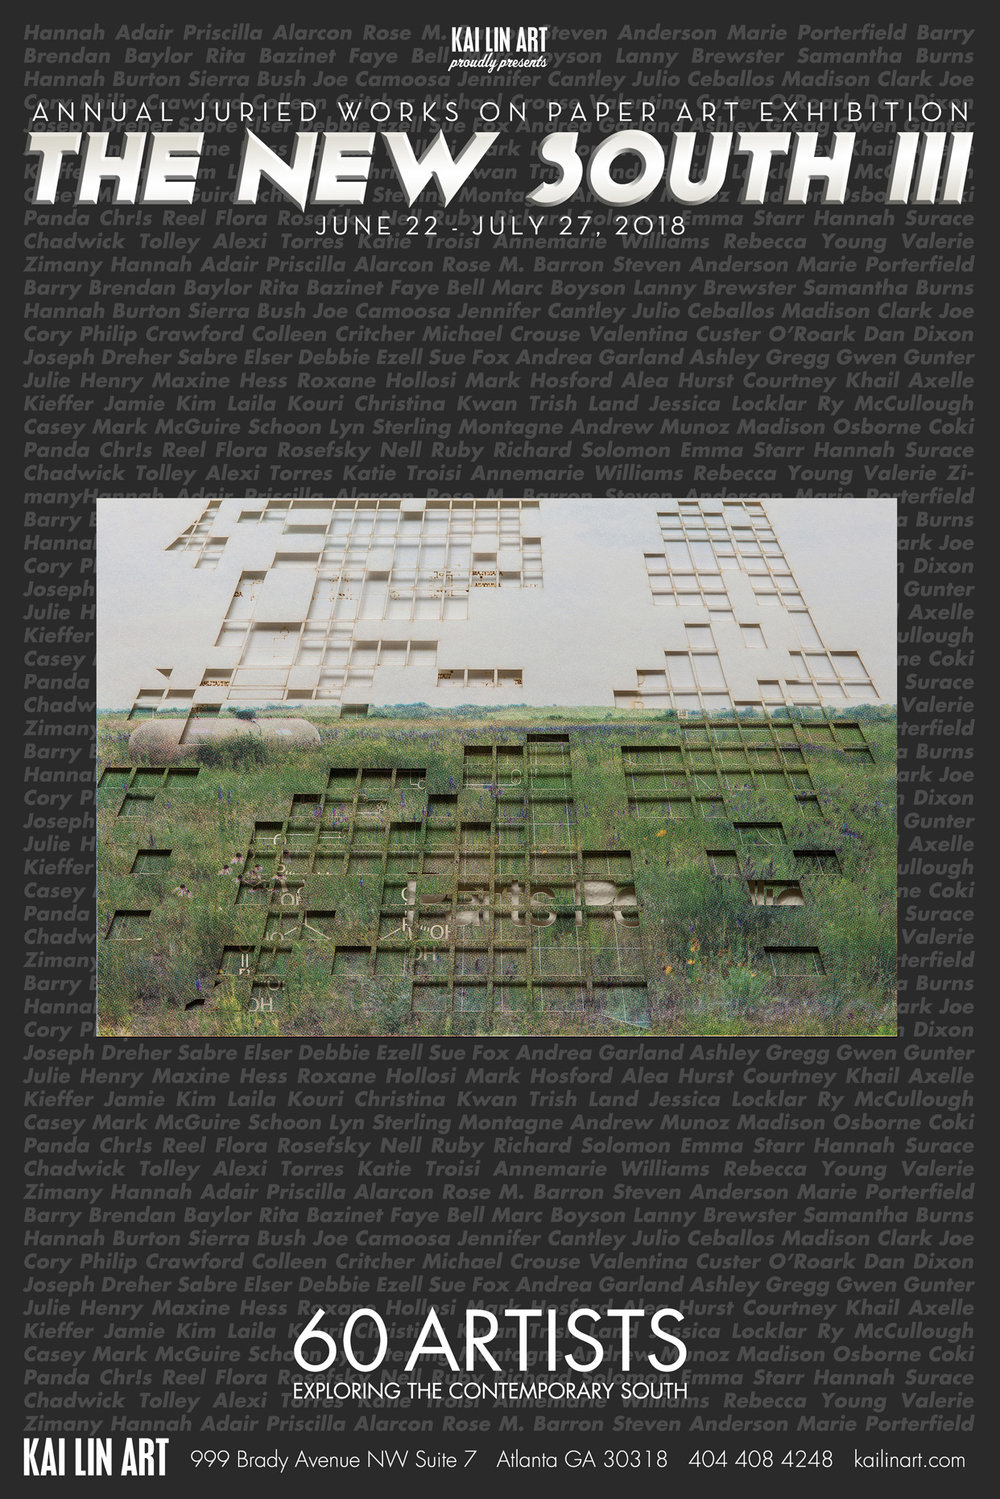 Baylor_Brendan_Ethanol_Landscape_IV_Screenprint_wi.jpg